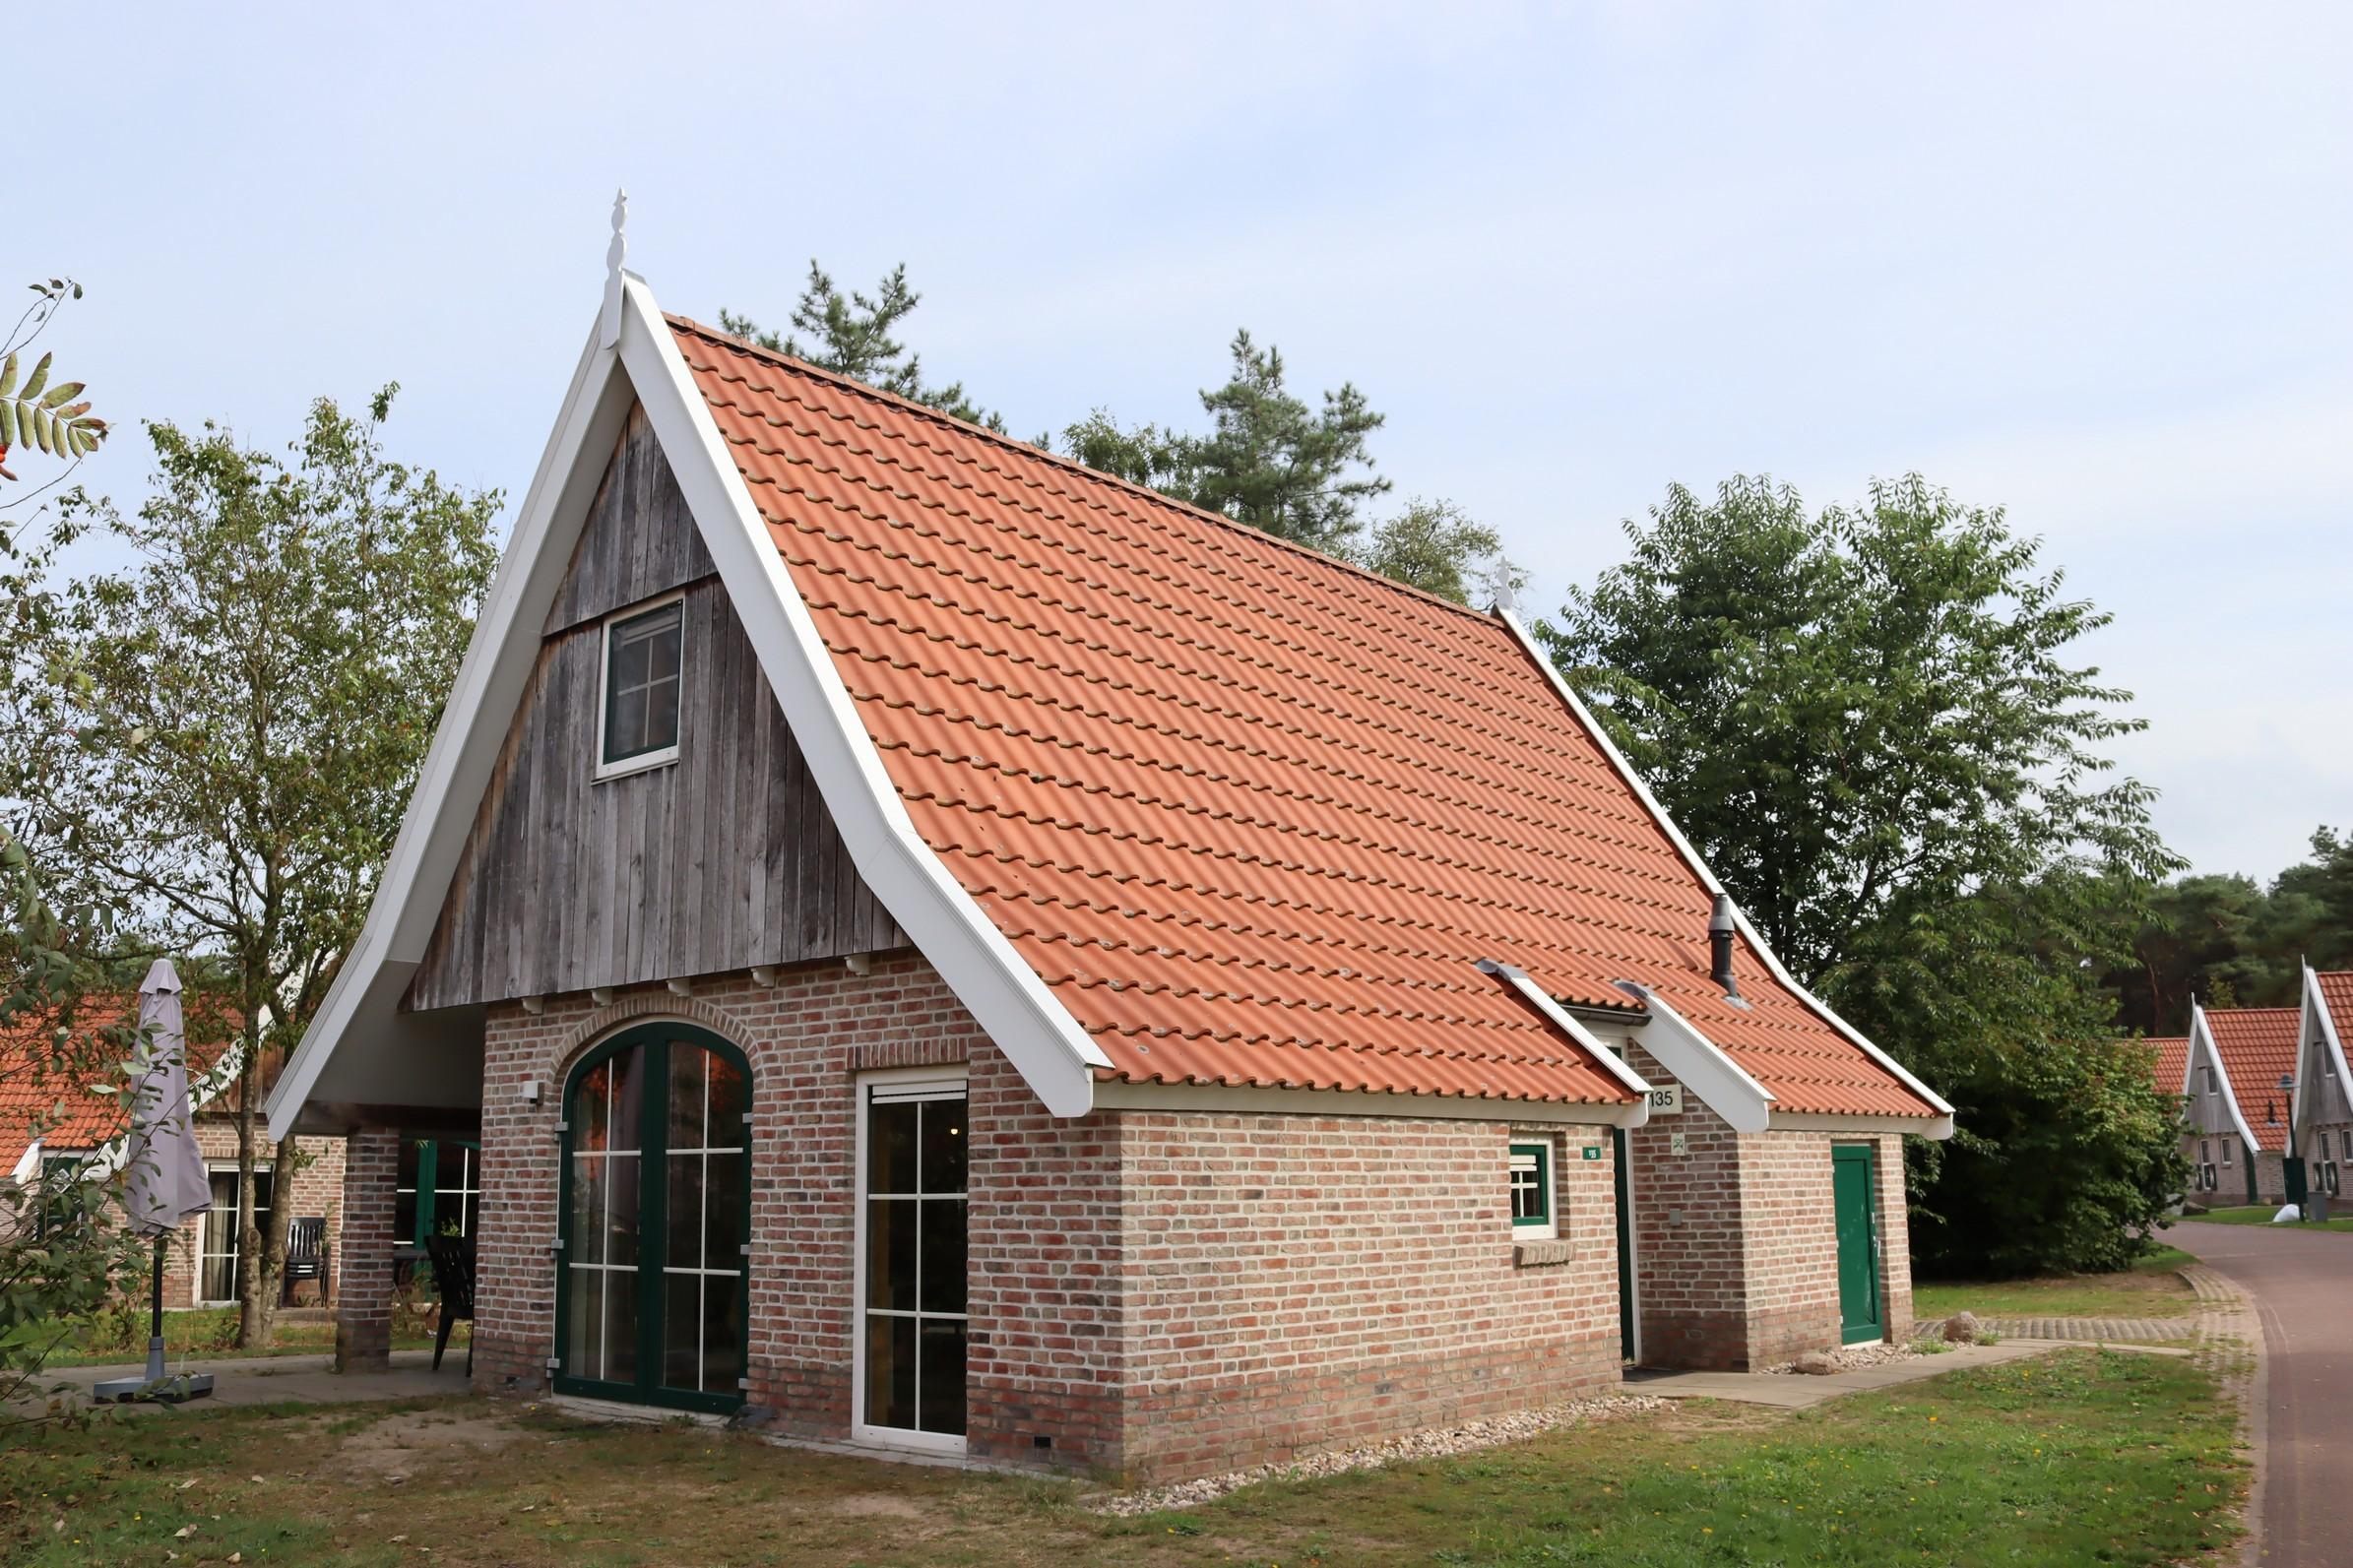 1. Recreatiewoning nr. 135 4-persoons Landal Landgoed De Hellendoornse Berg